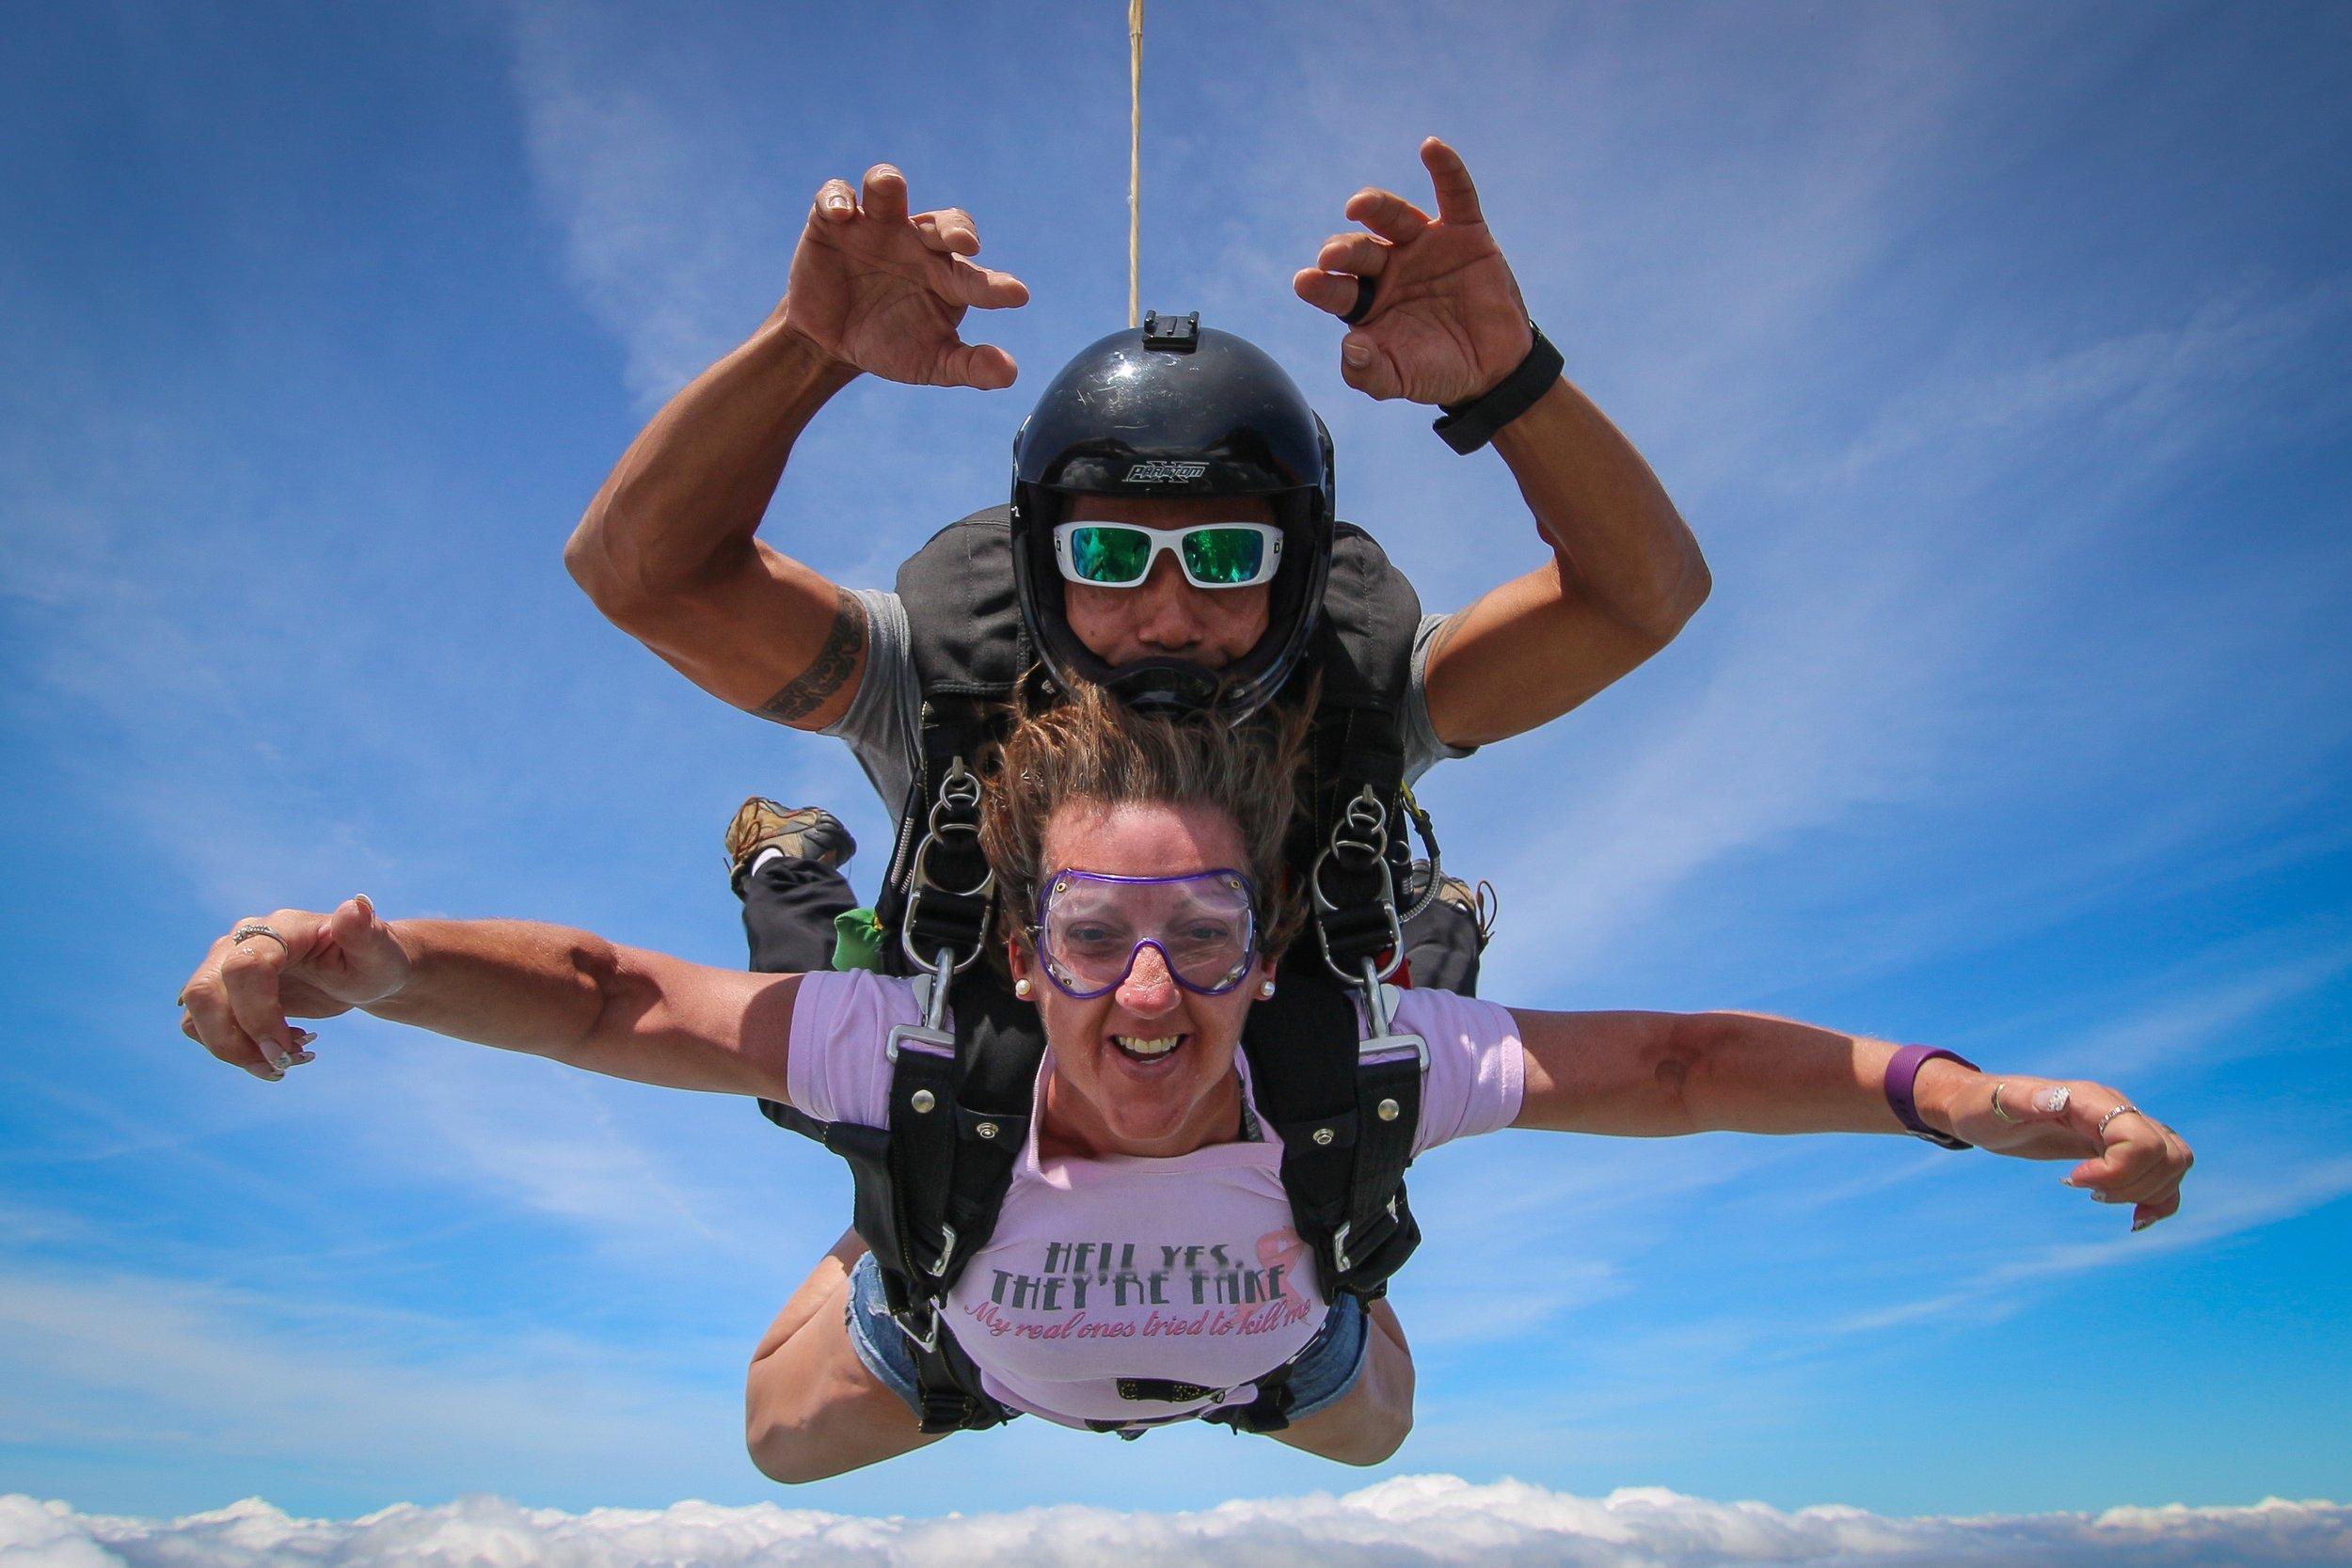 Stephanie In free fall